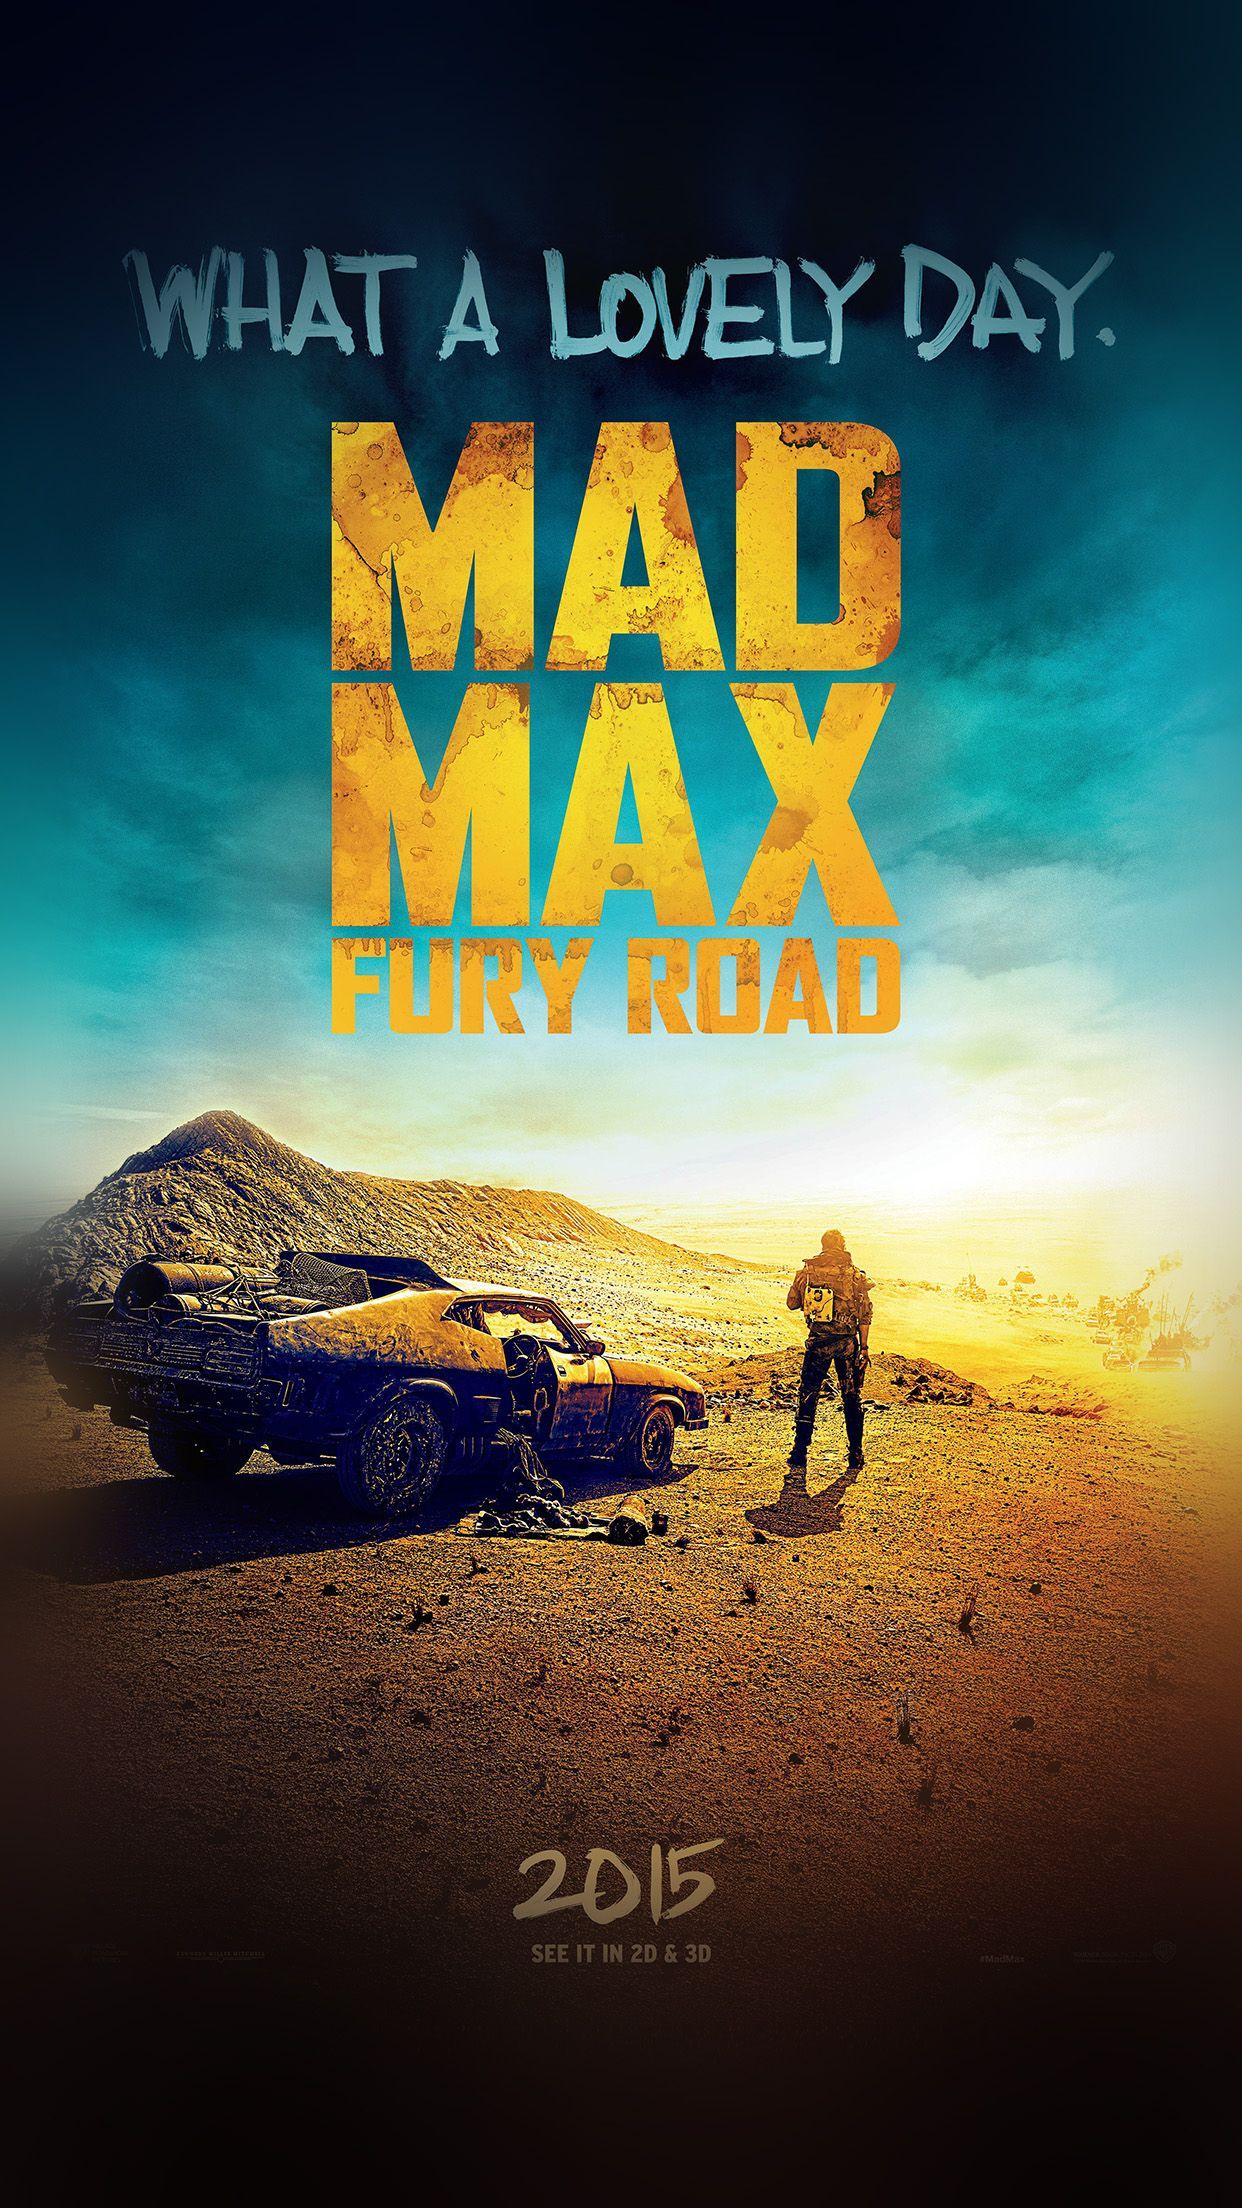 Poster design hd - Poster Movie Mad Max Fury Road Cinema